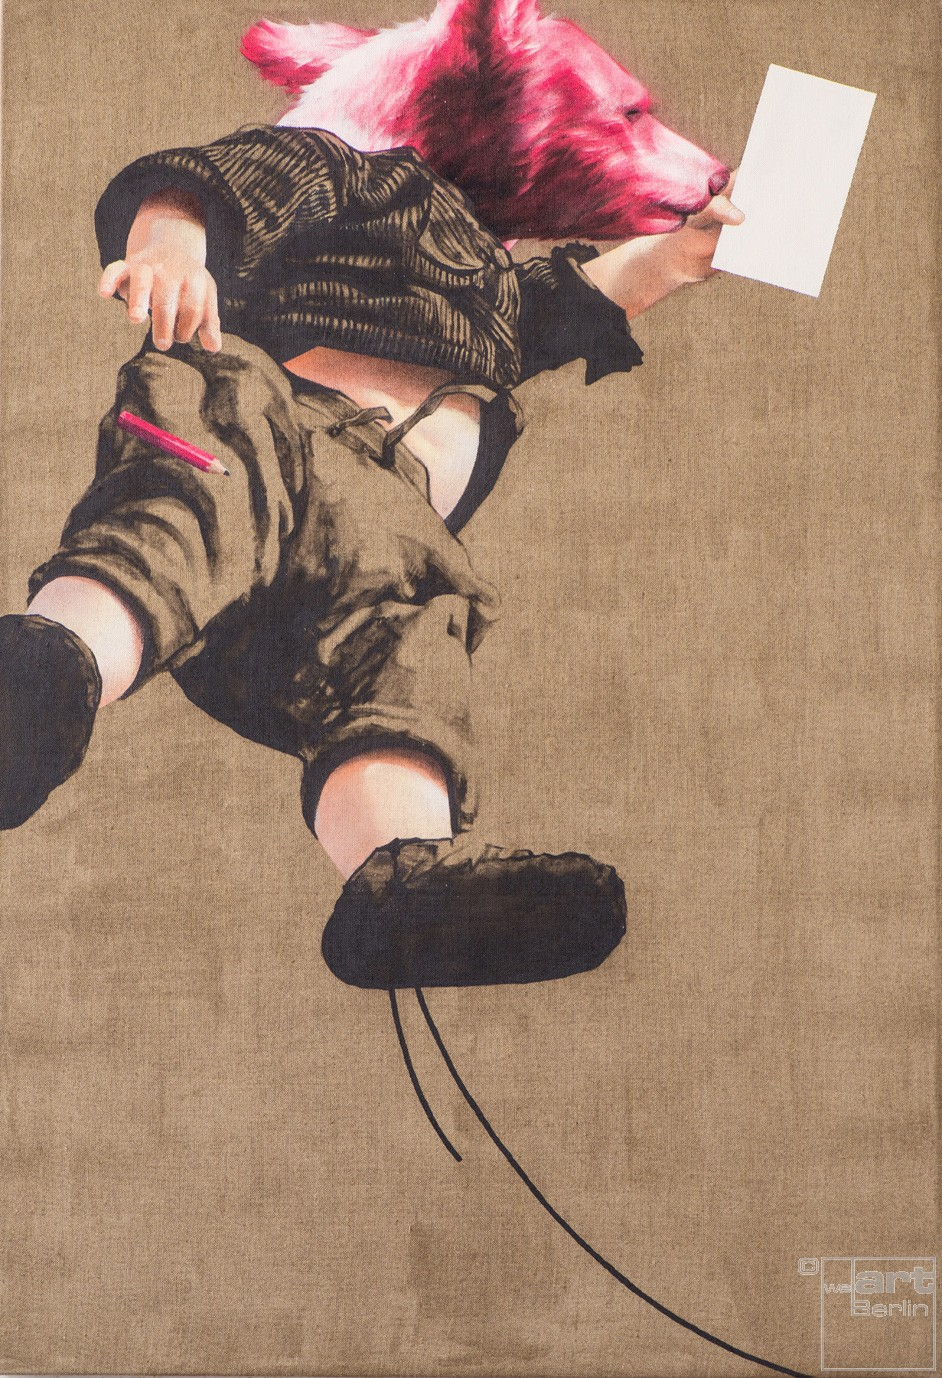 Pflegeleicht | Malerei von Jakob Tory Bardou, innerfields | Acryl auf Leinwand, Urban Art